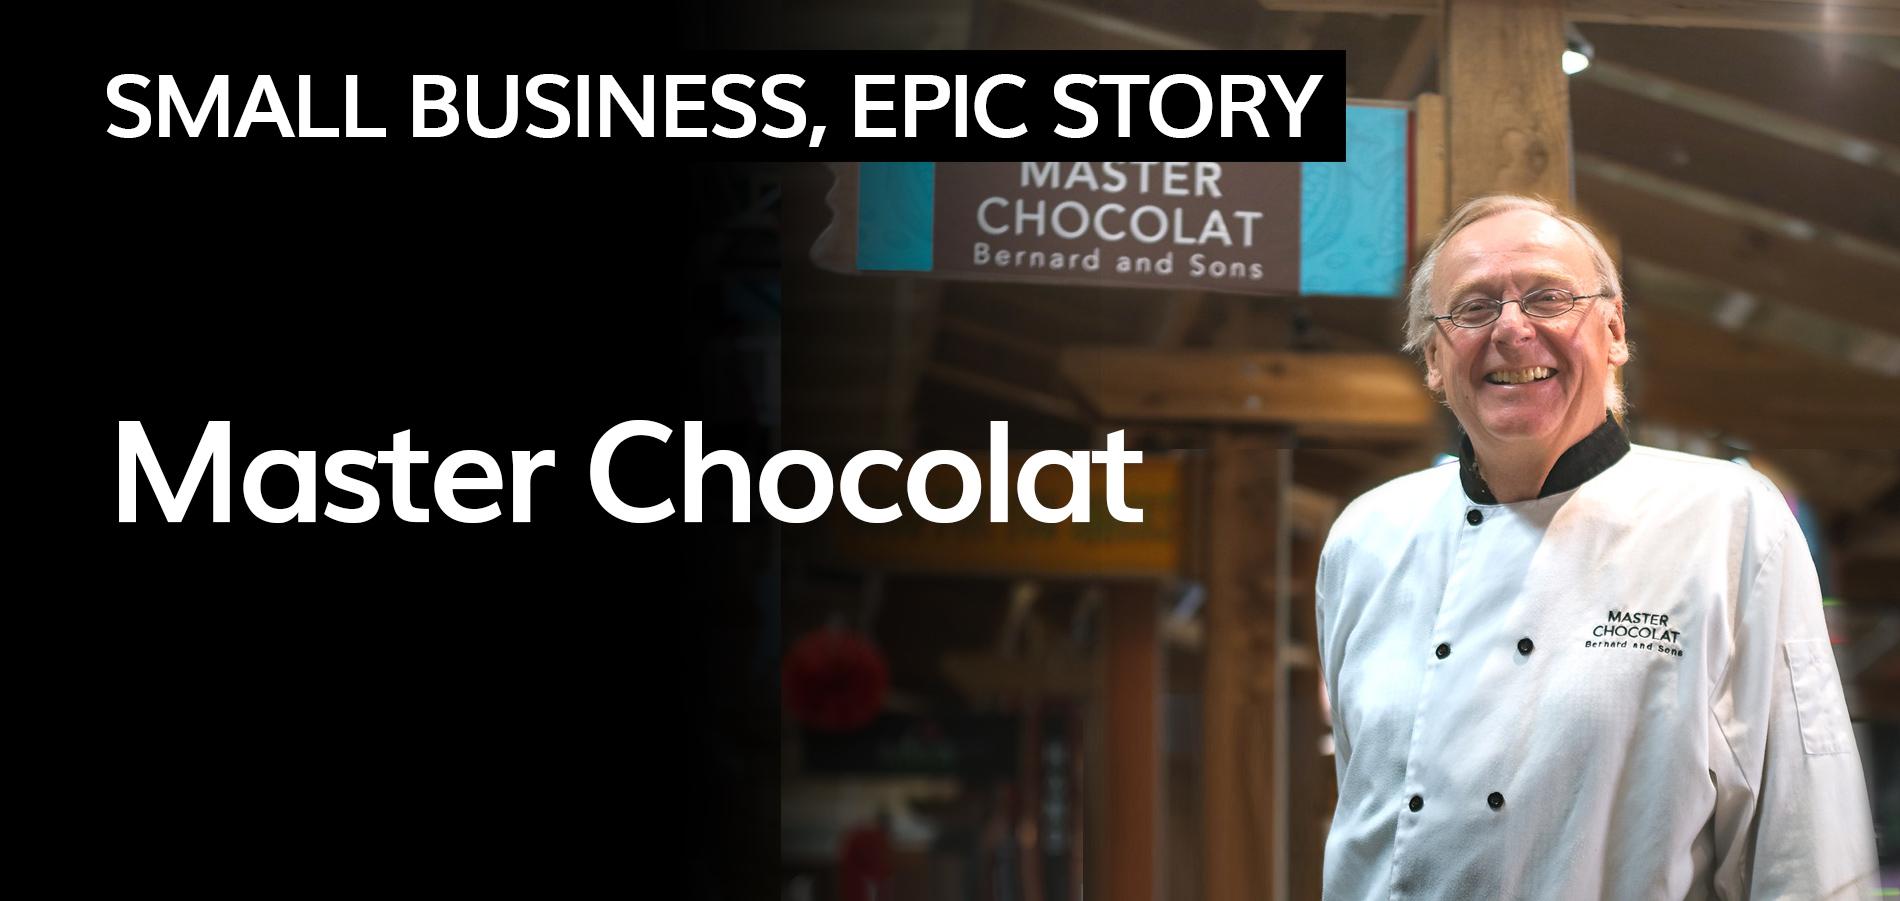 master chocolat cover photo bernard callebaut